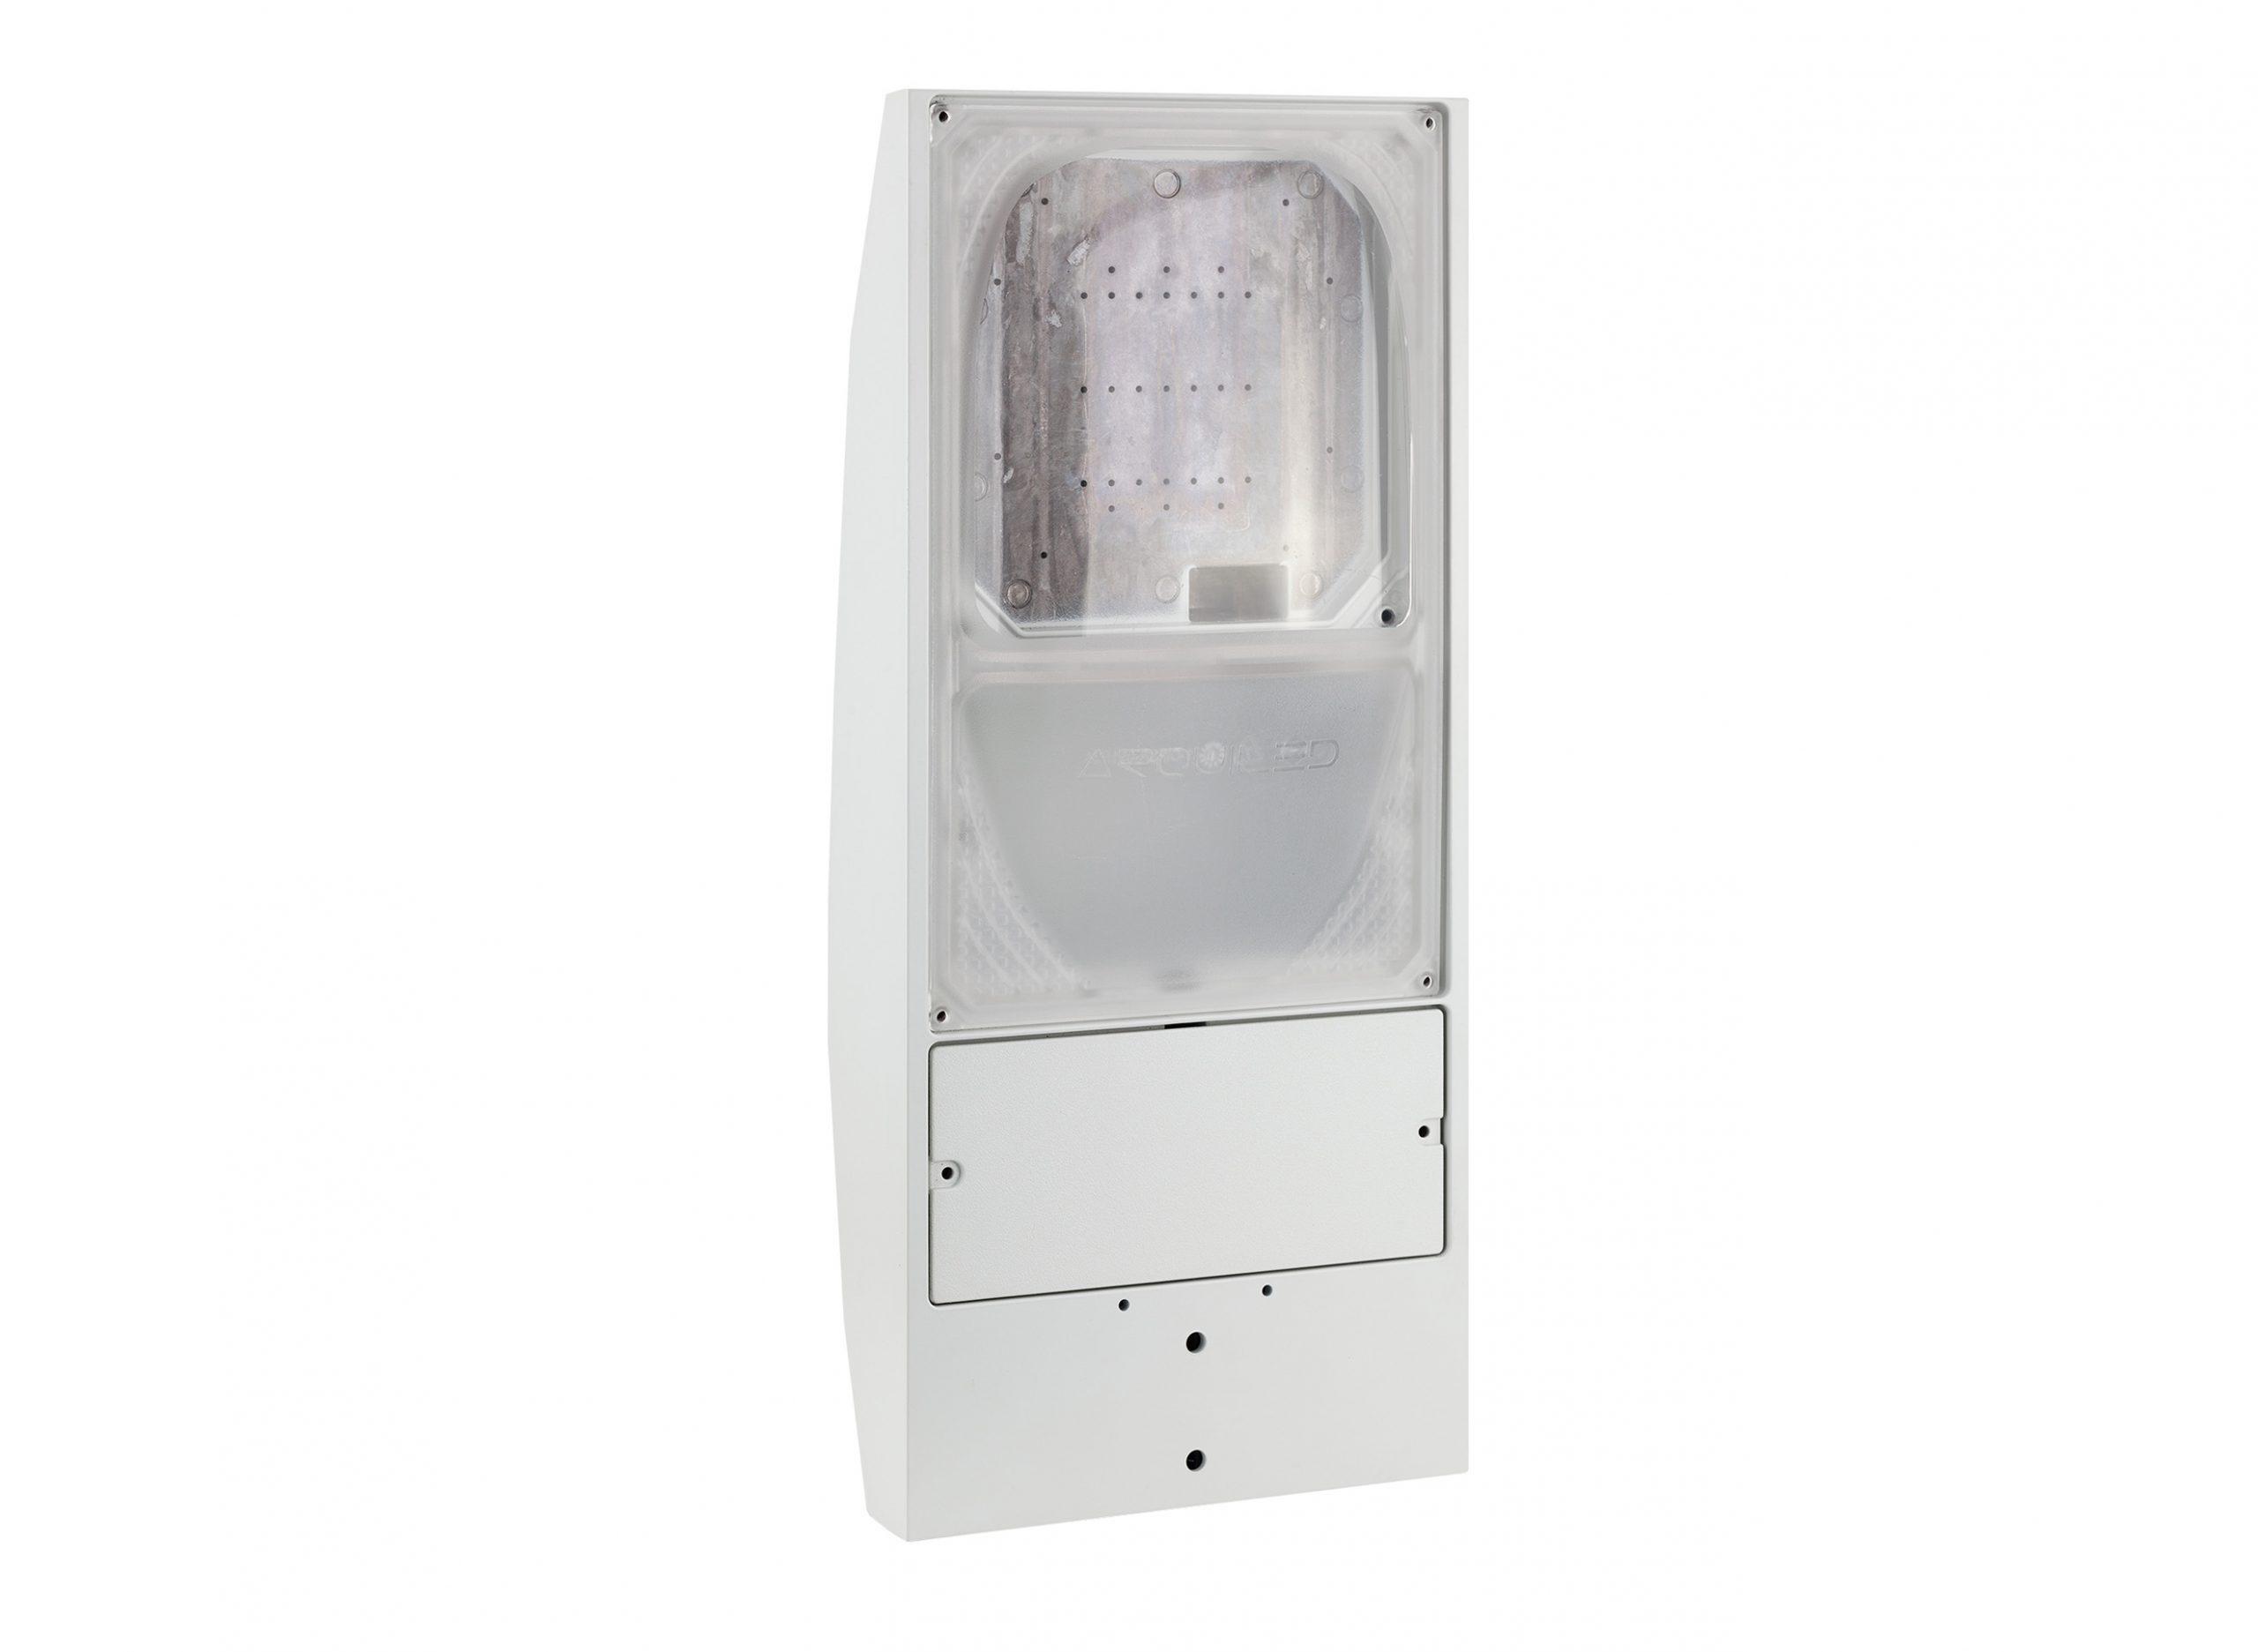 prifer-mold__0018_prifer-mold_40_0005_prifer-mold_77_0010_prifer_plastic_49